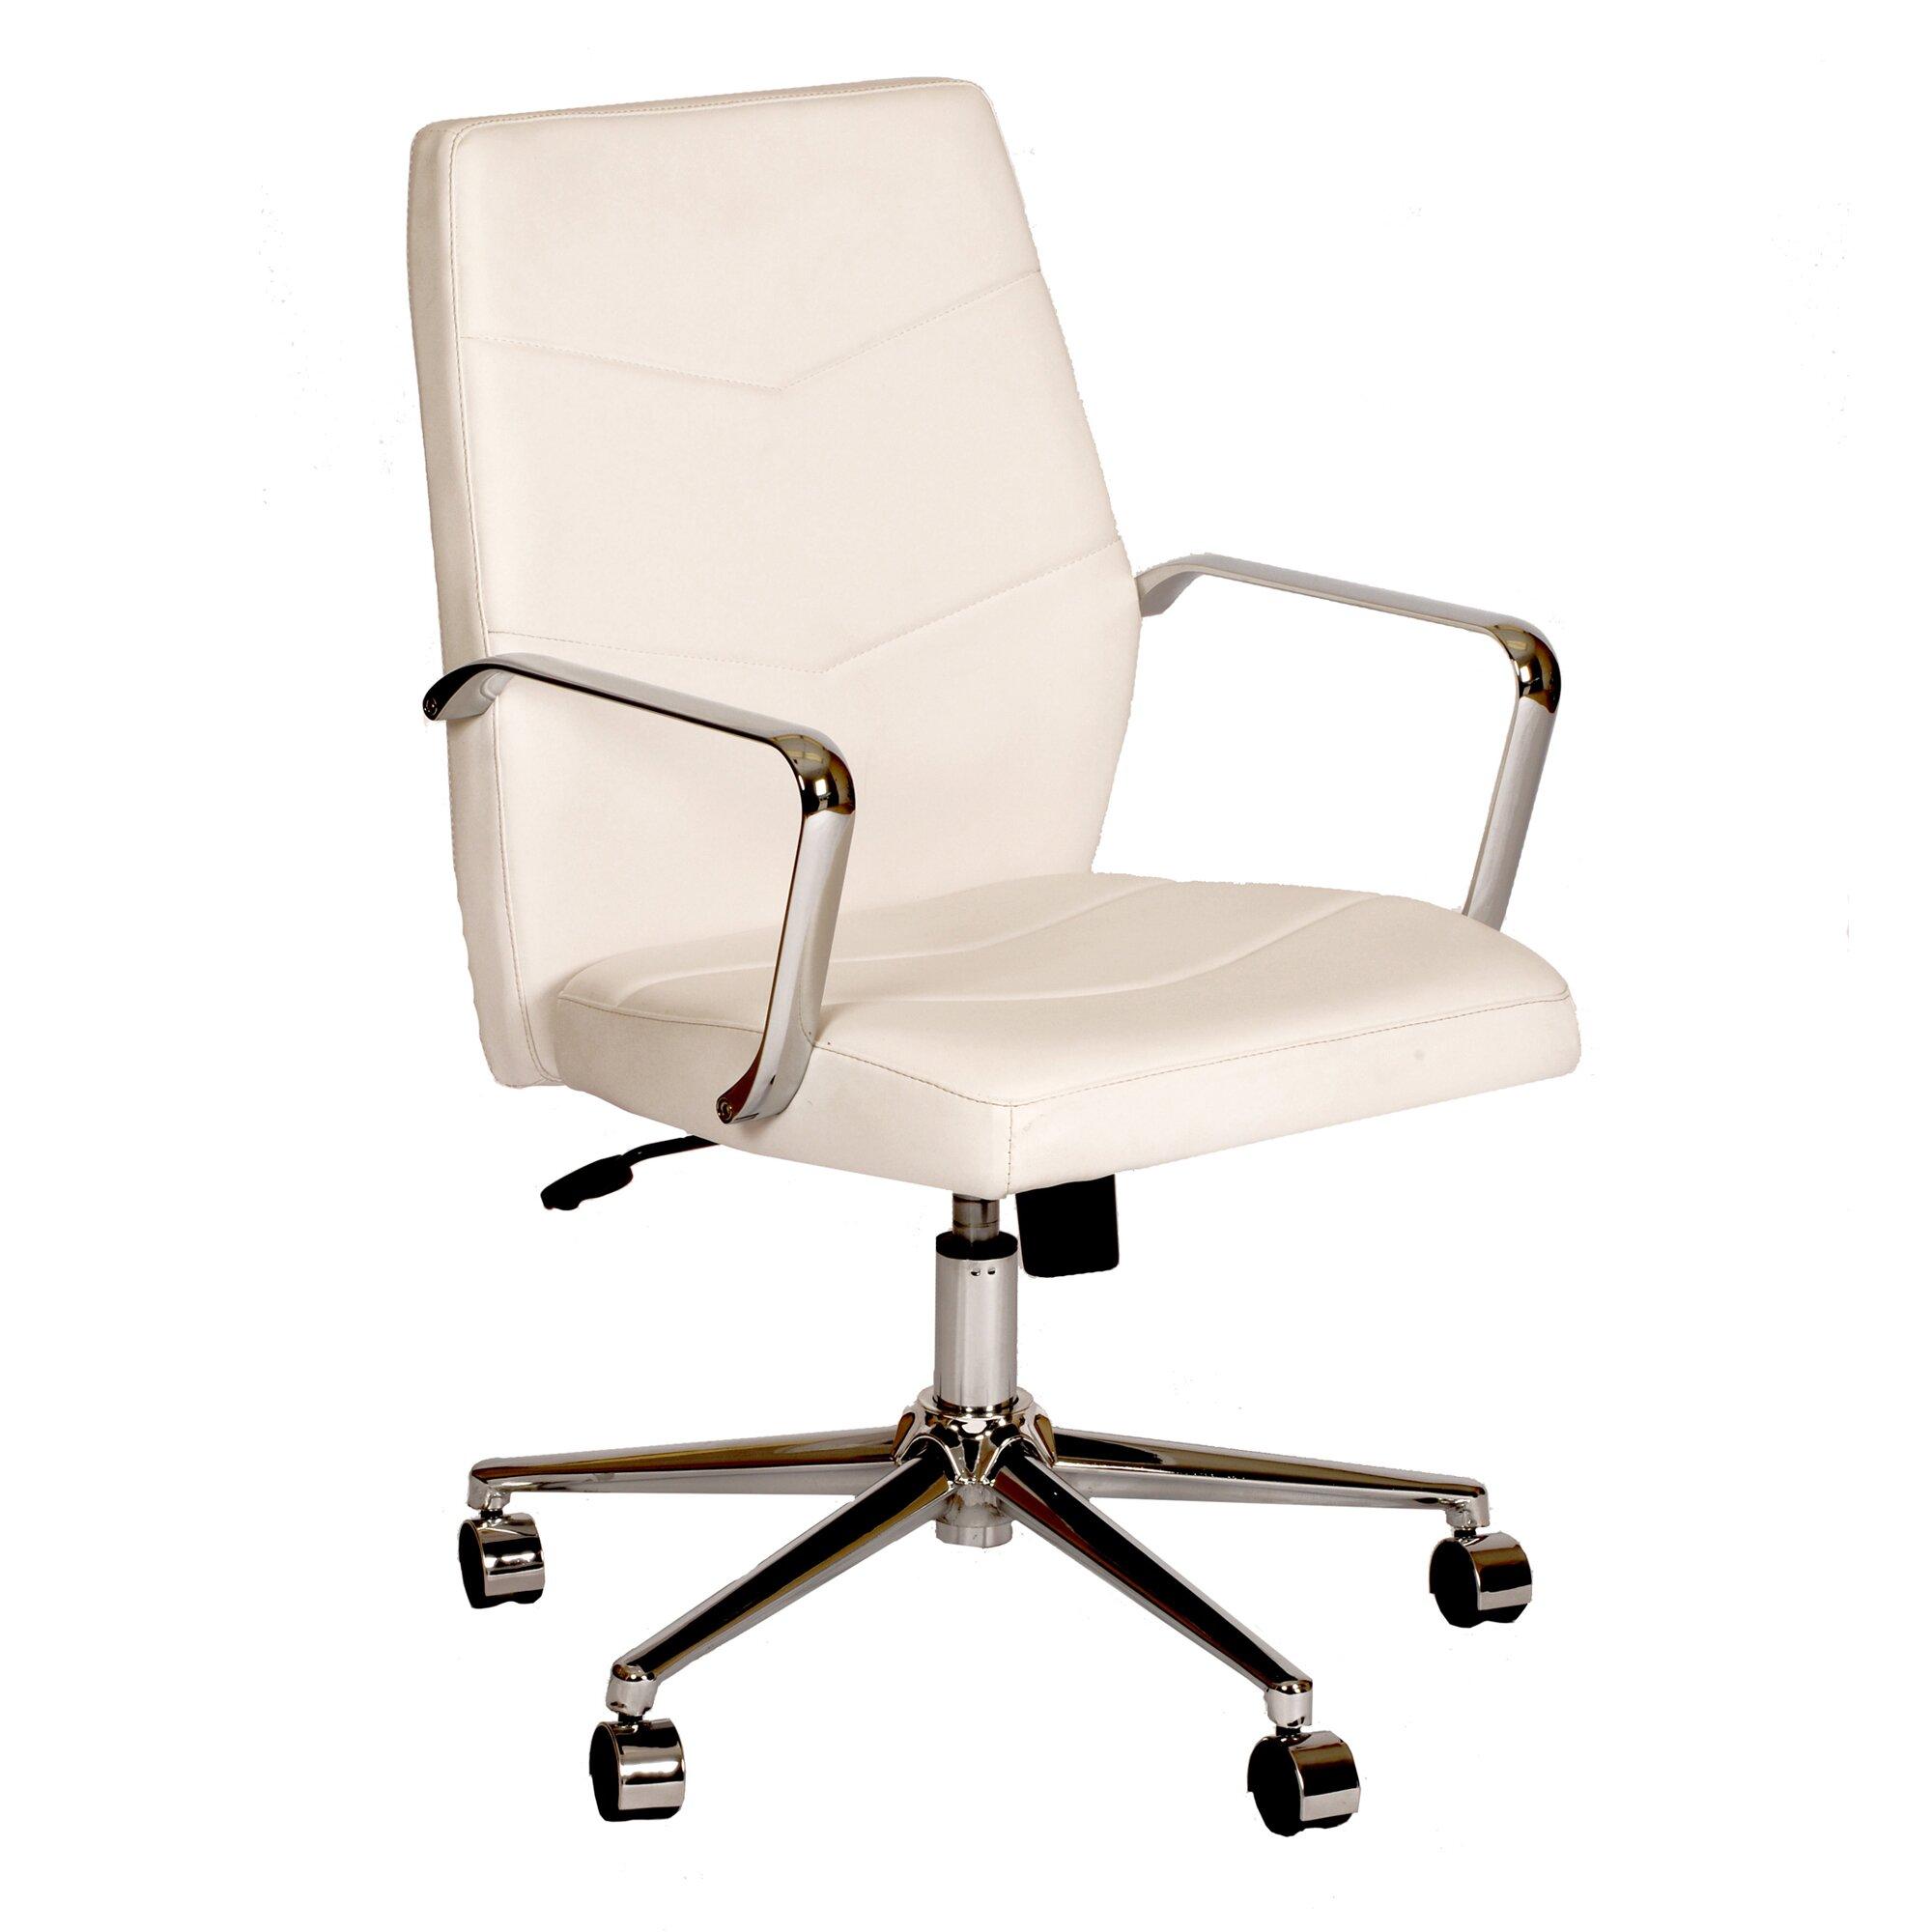 Brayden Studio Viken Mid Back Office Chair Reviews Wayfair